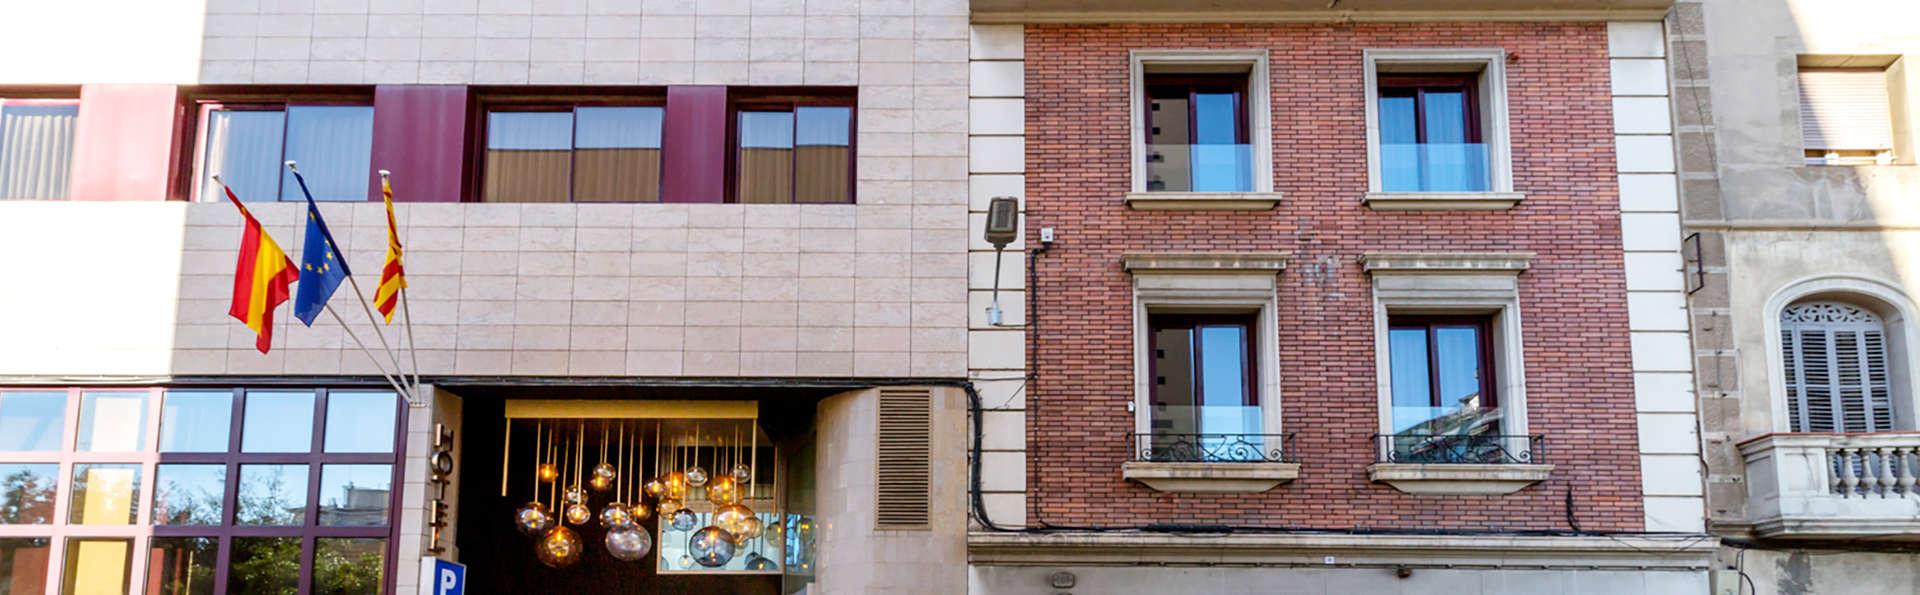 Hotel Ronda Lesseps - Edit_Front2.jpg